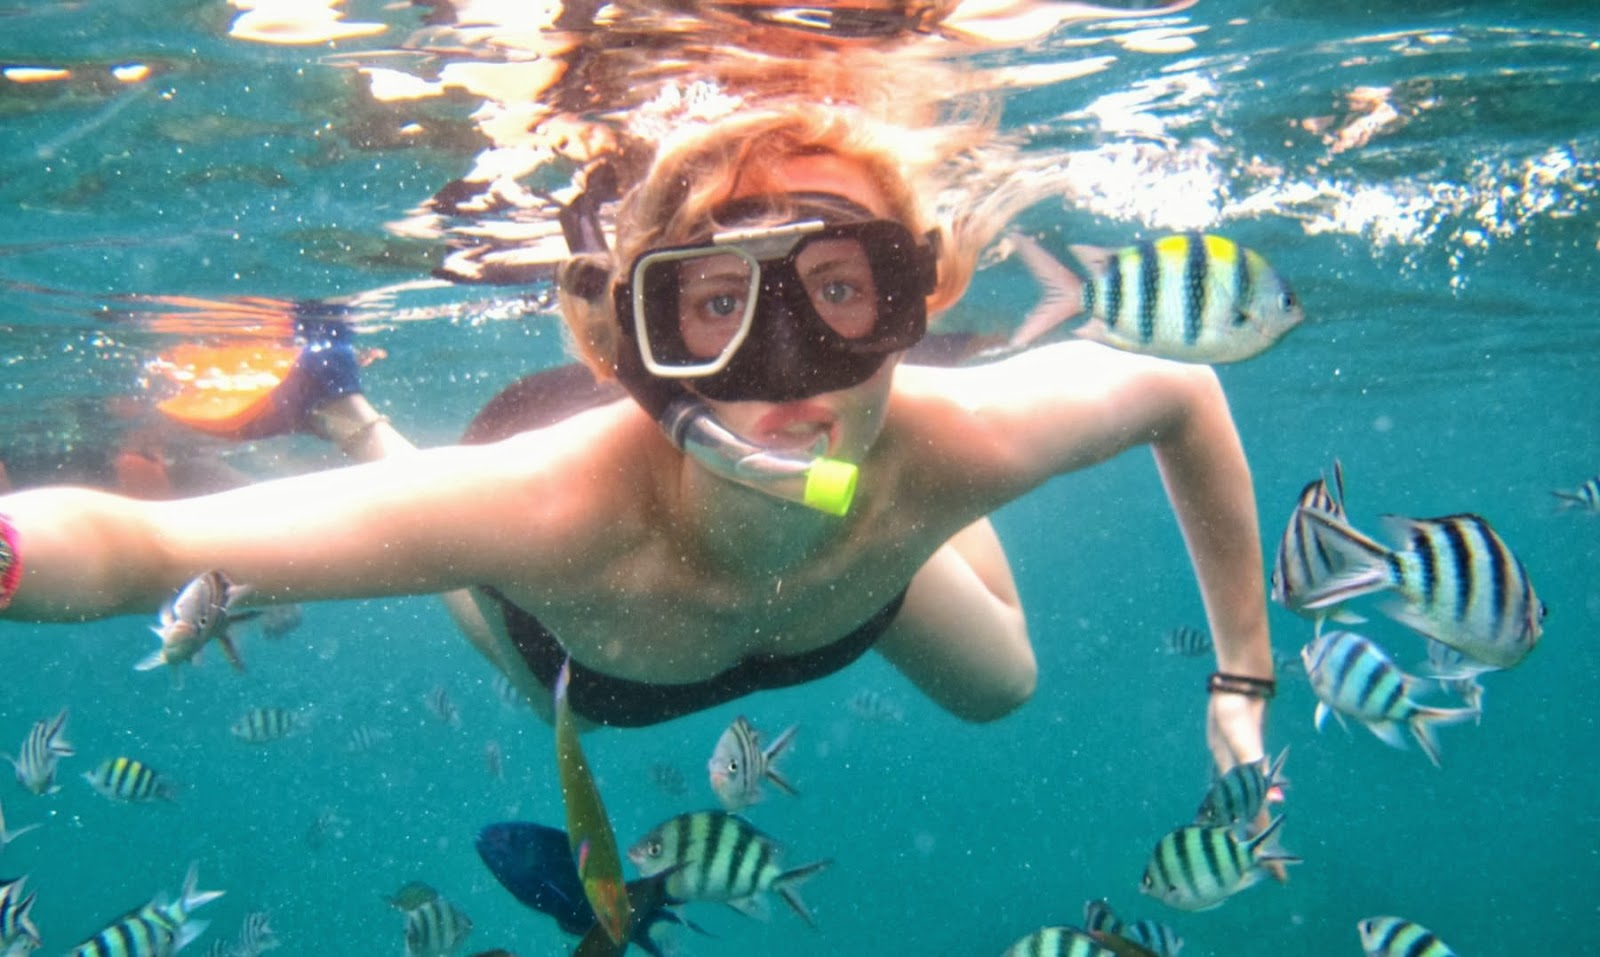 Pulau Perhentian Island Coral Feef and Fish Swimming